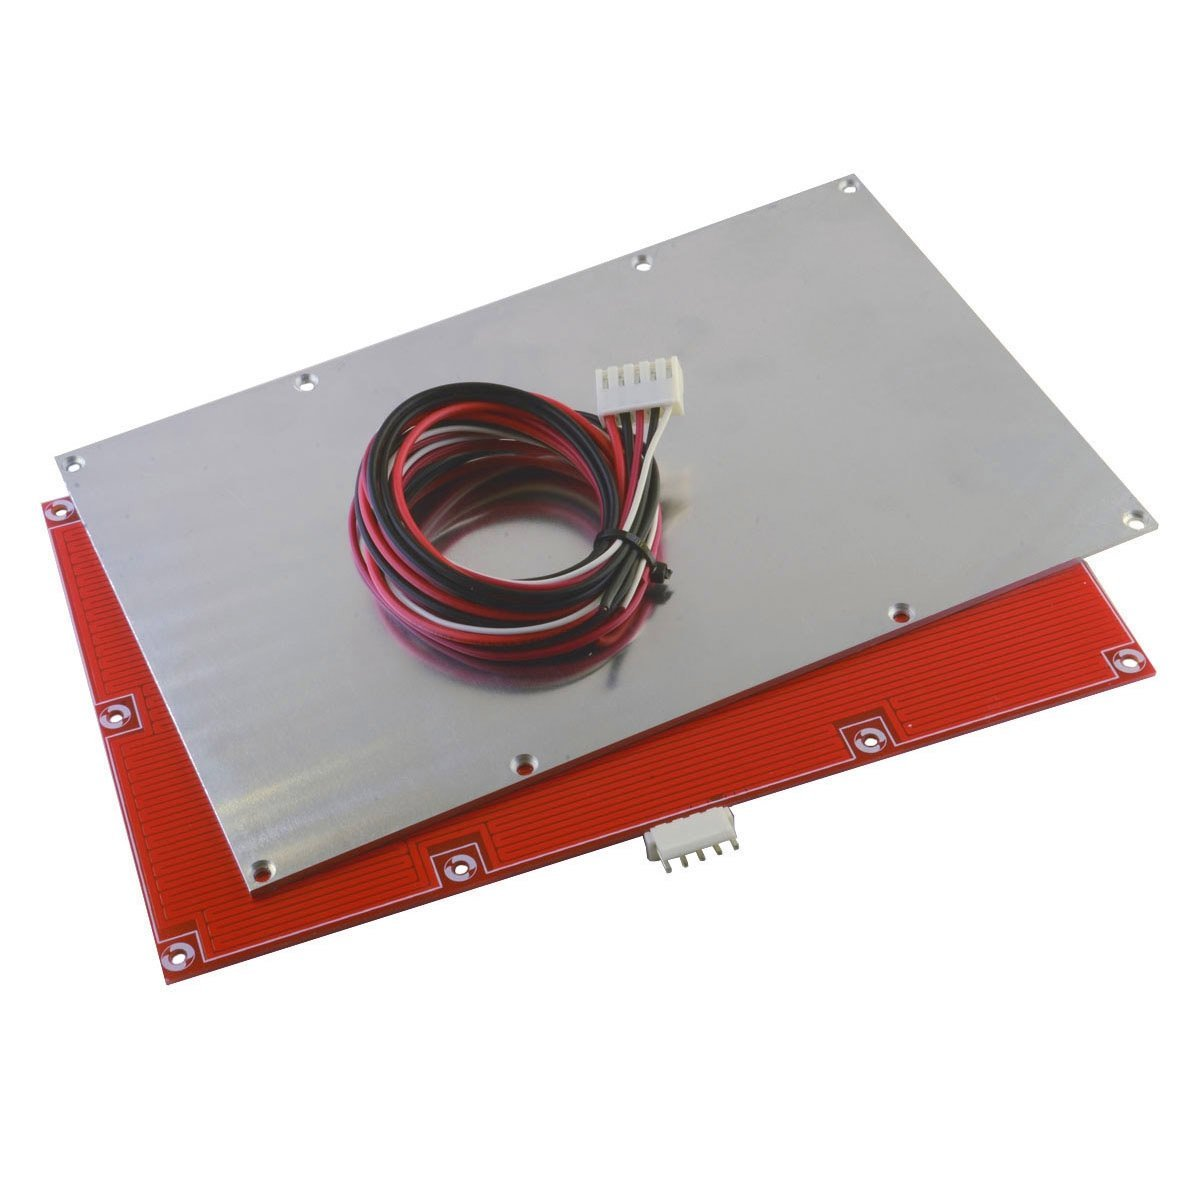 Reprap Champion Flashforge Monoprice 3d Printer 24v Wiring Diagram Heated Bed Kit T15x23 Alu Plate Cable Industrial Scientific